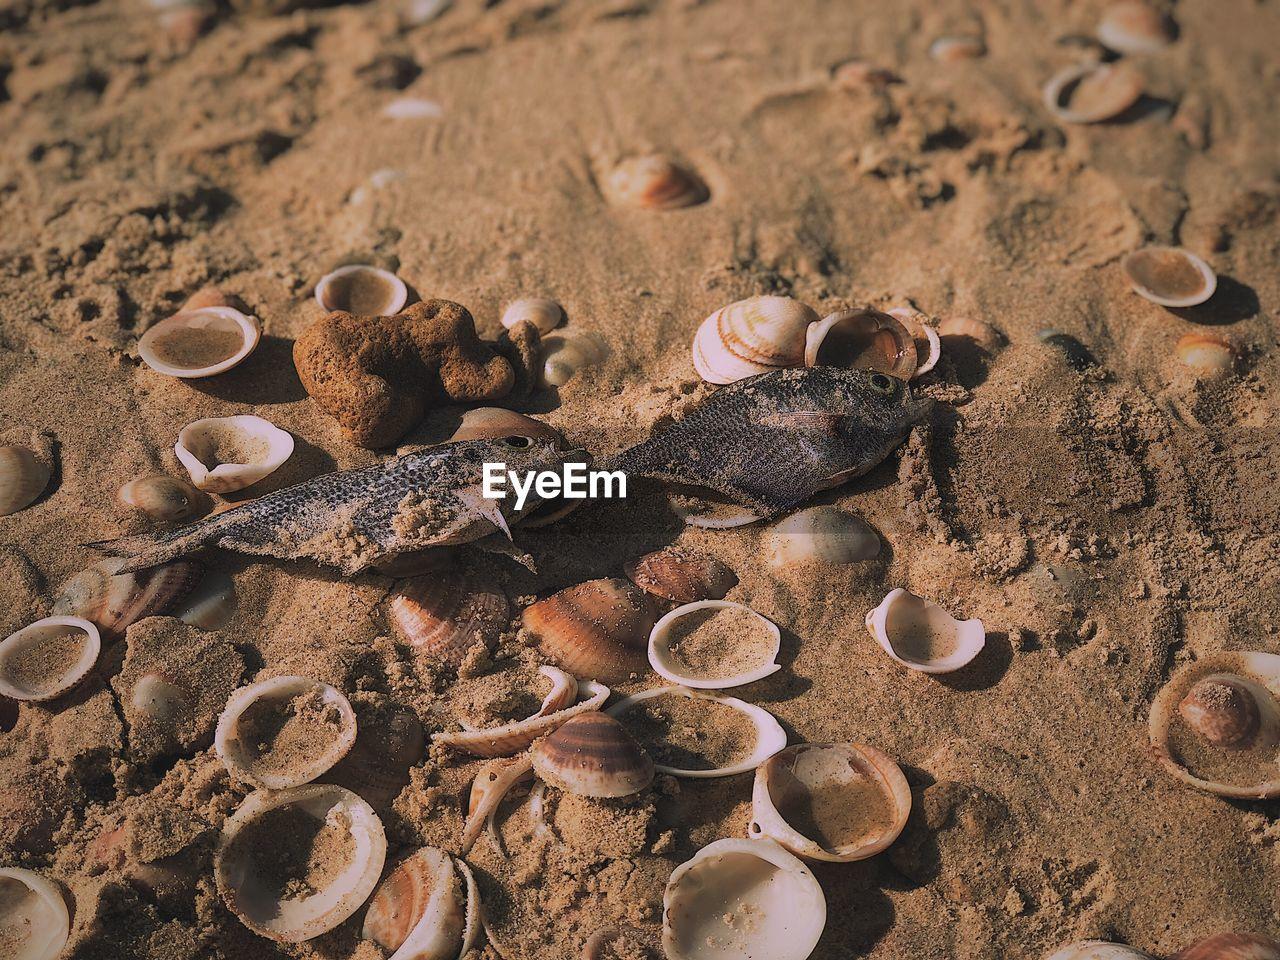 High angle view of fish on sand